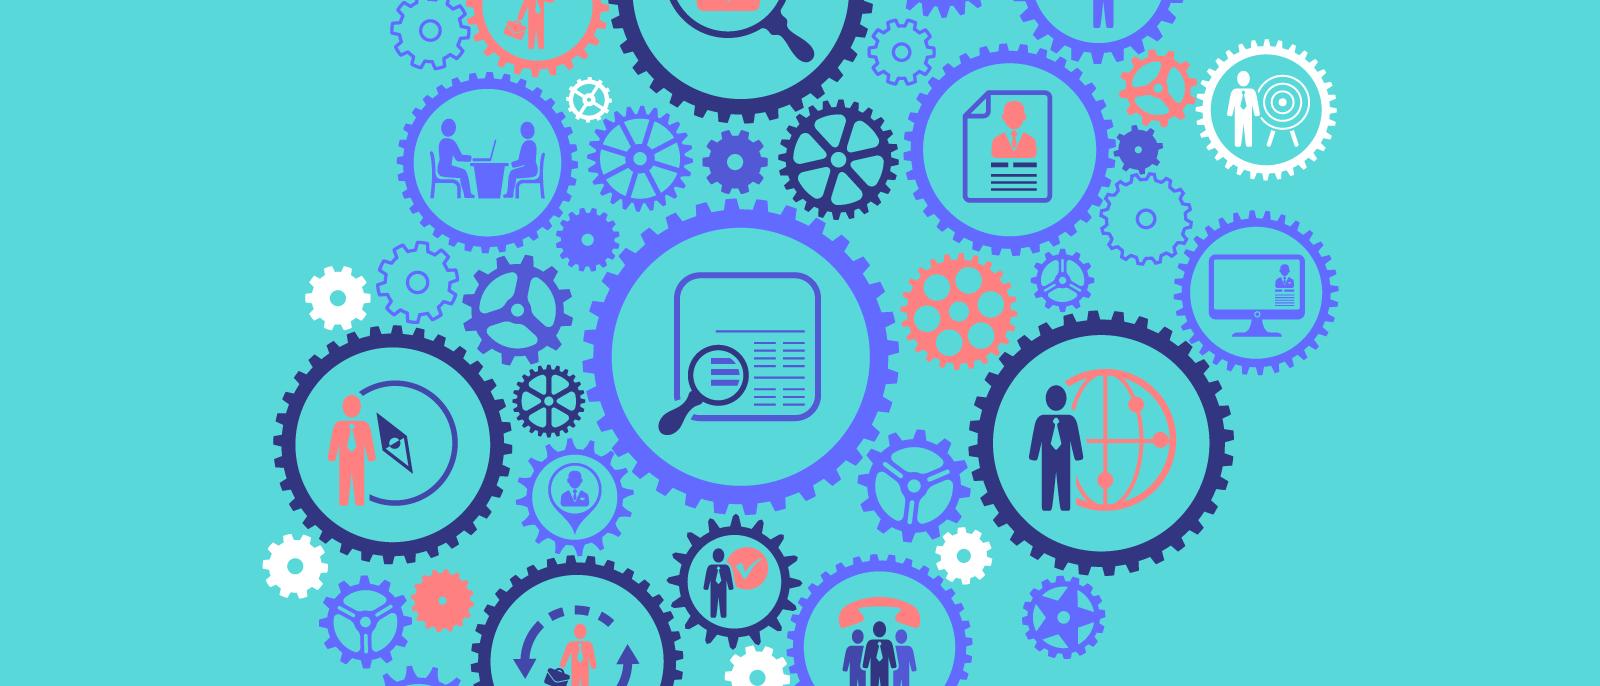 All About The Human Resources Job Screening Process Lucidchart Blog